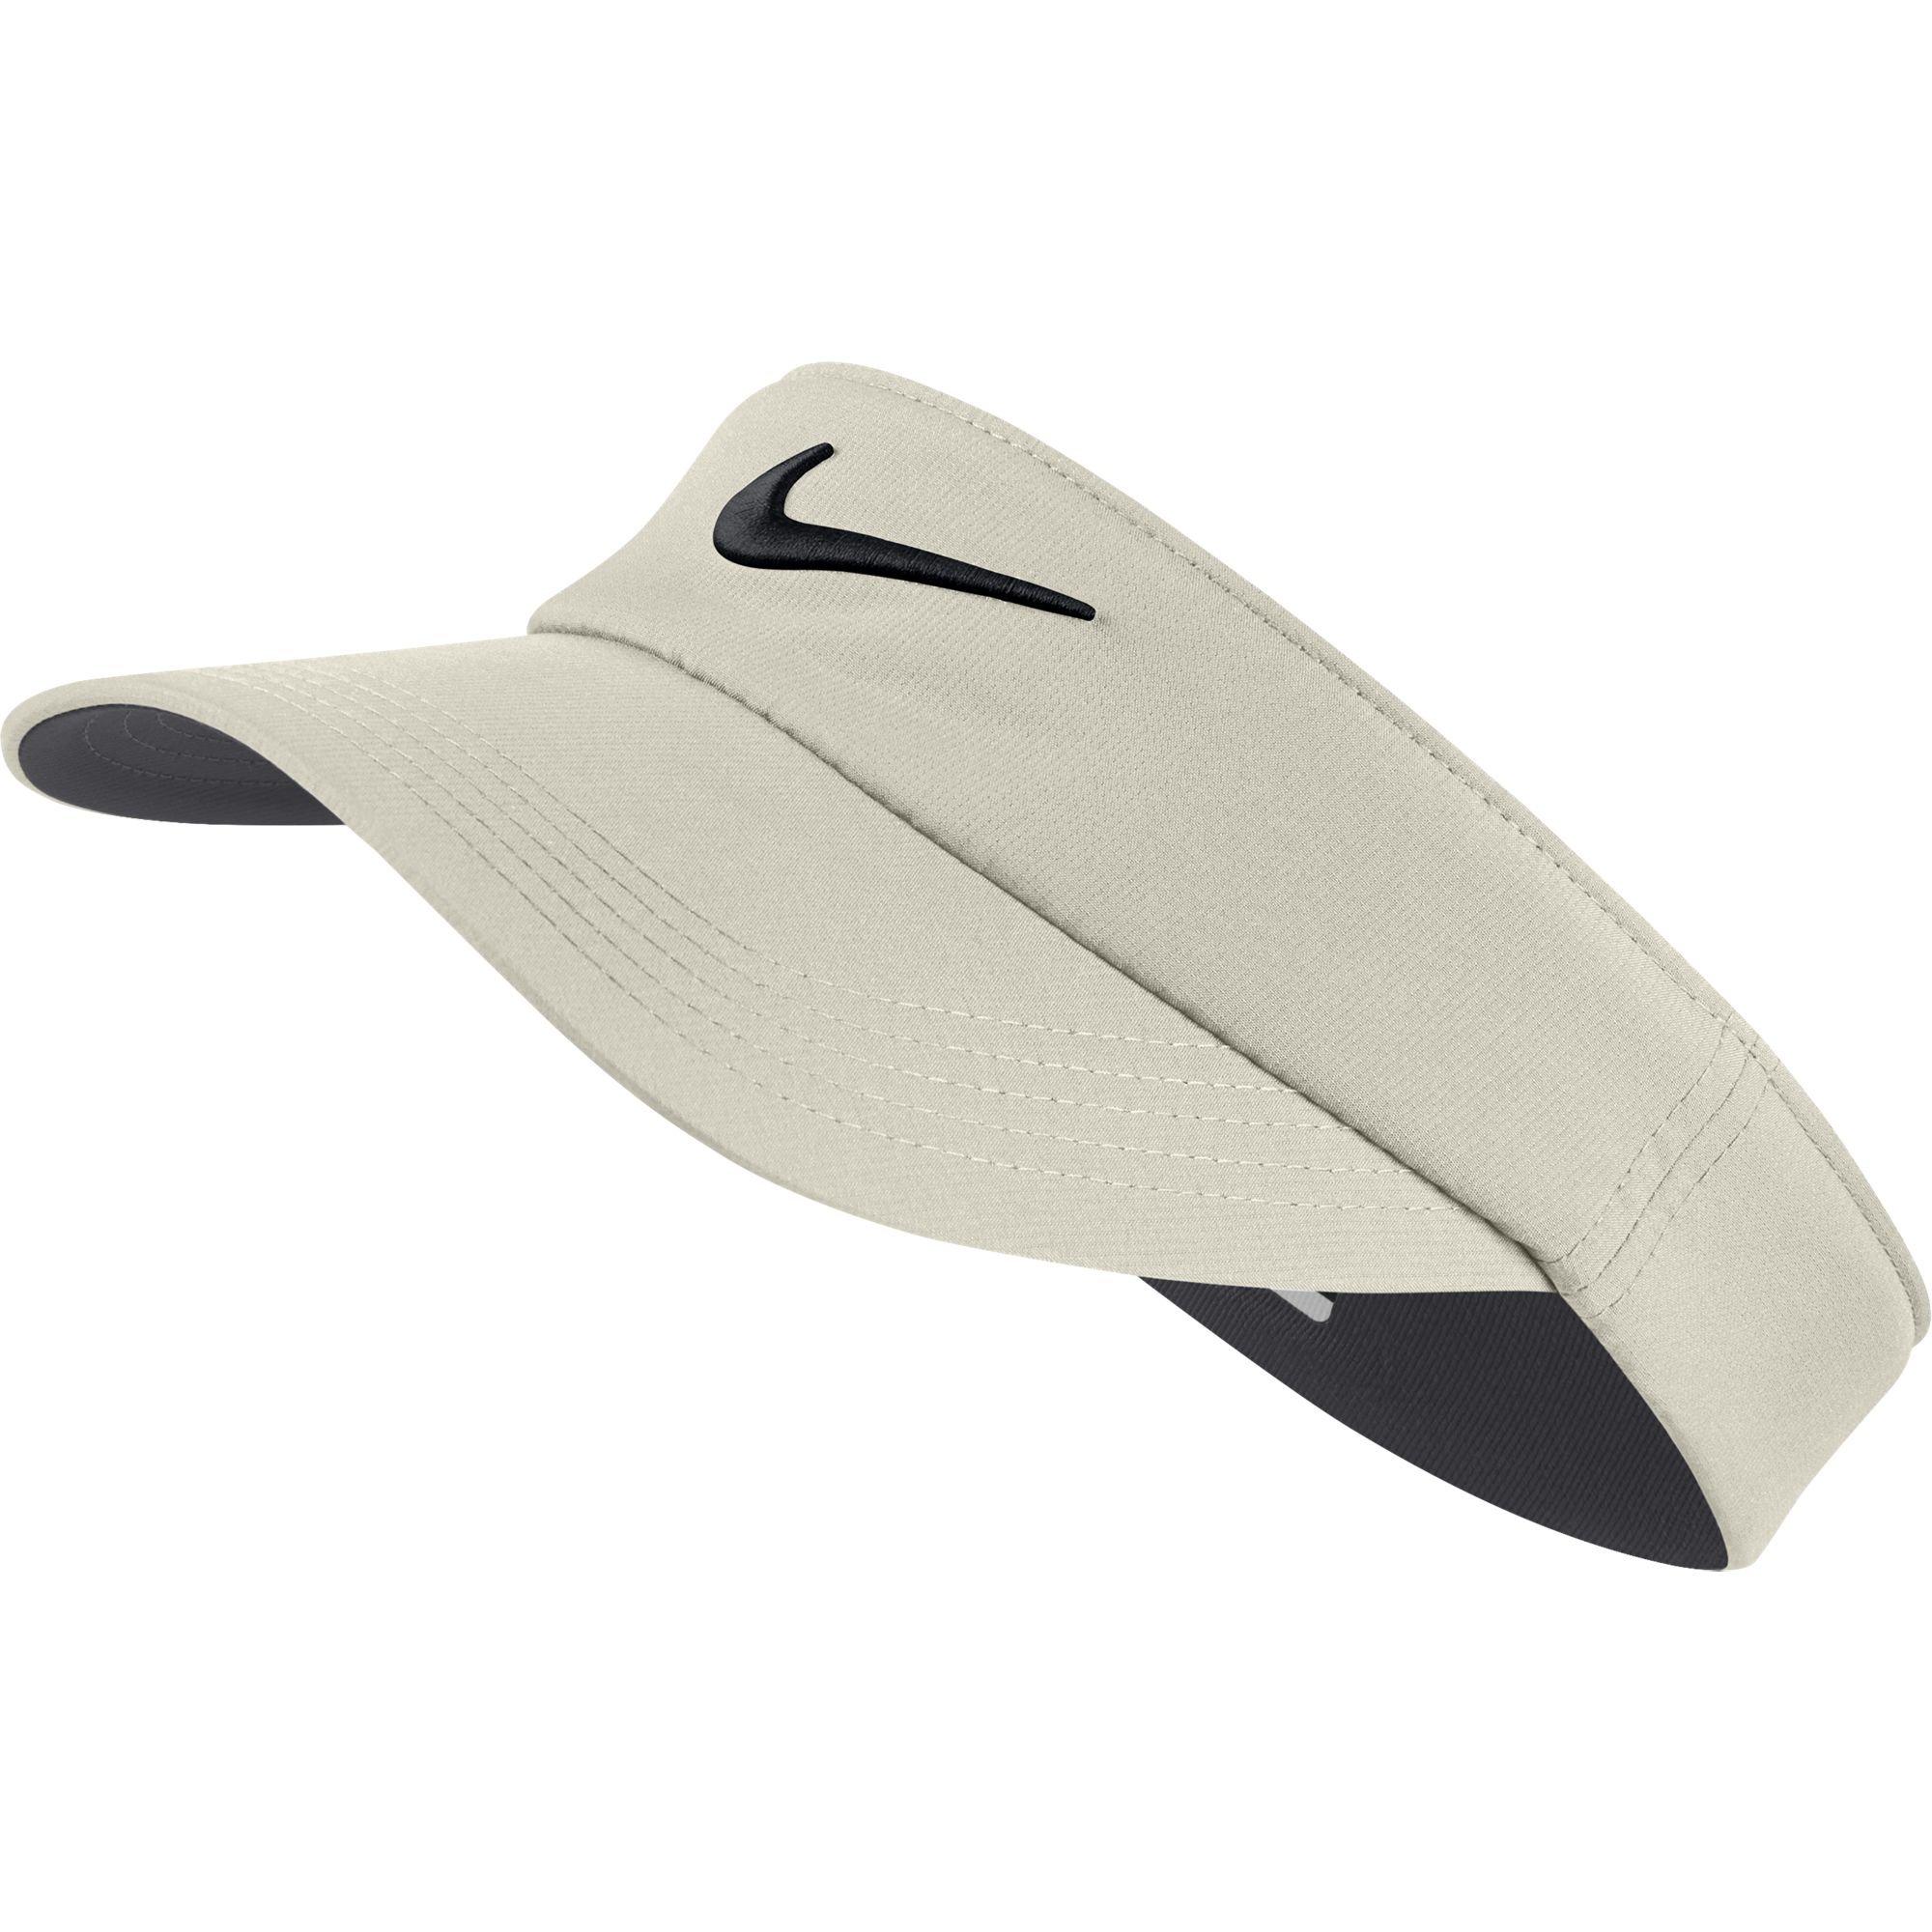 NIKE Unisex Core Golf Visor, Light Bone/Anthracite/Black, One Size